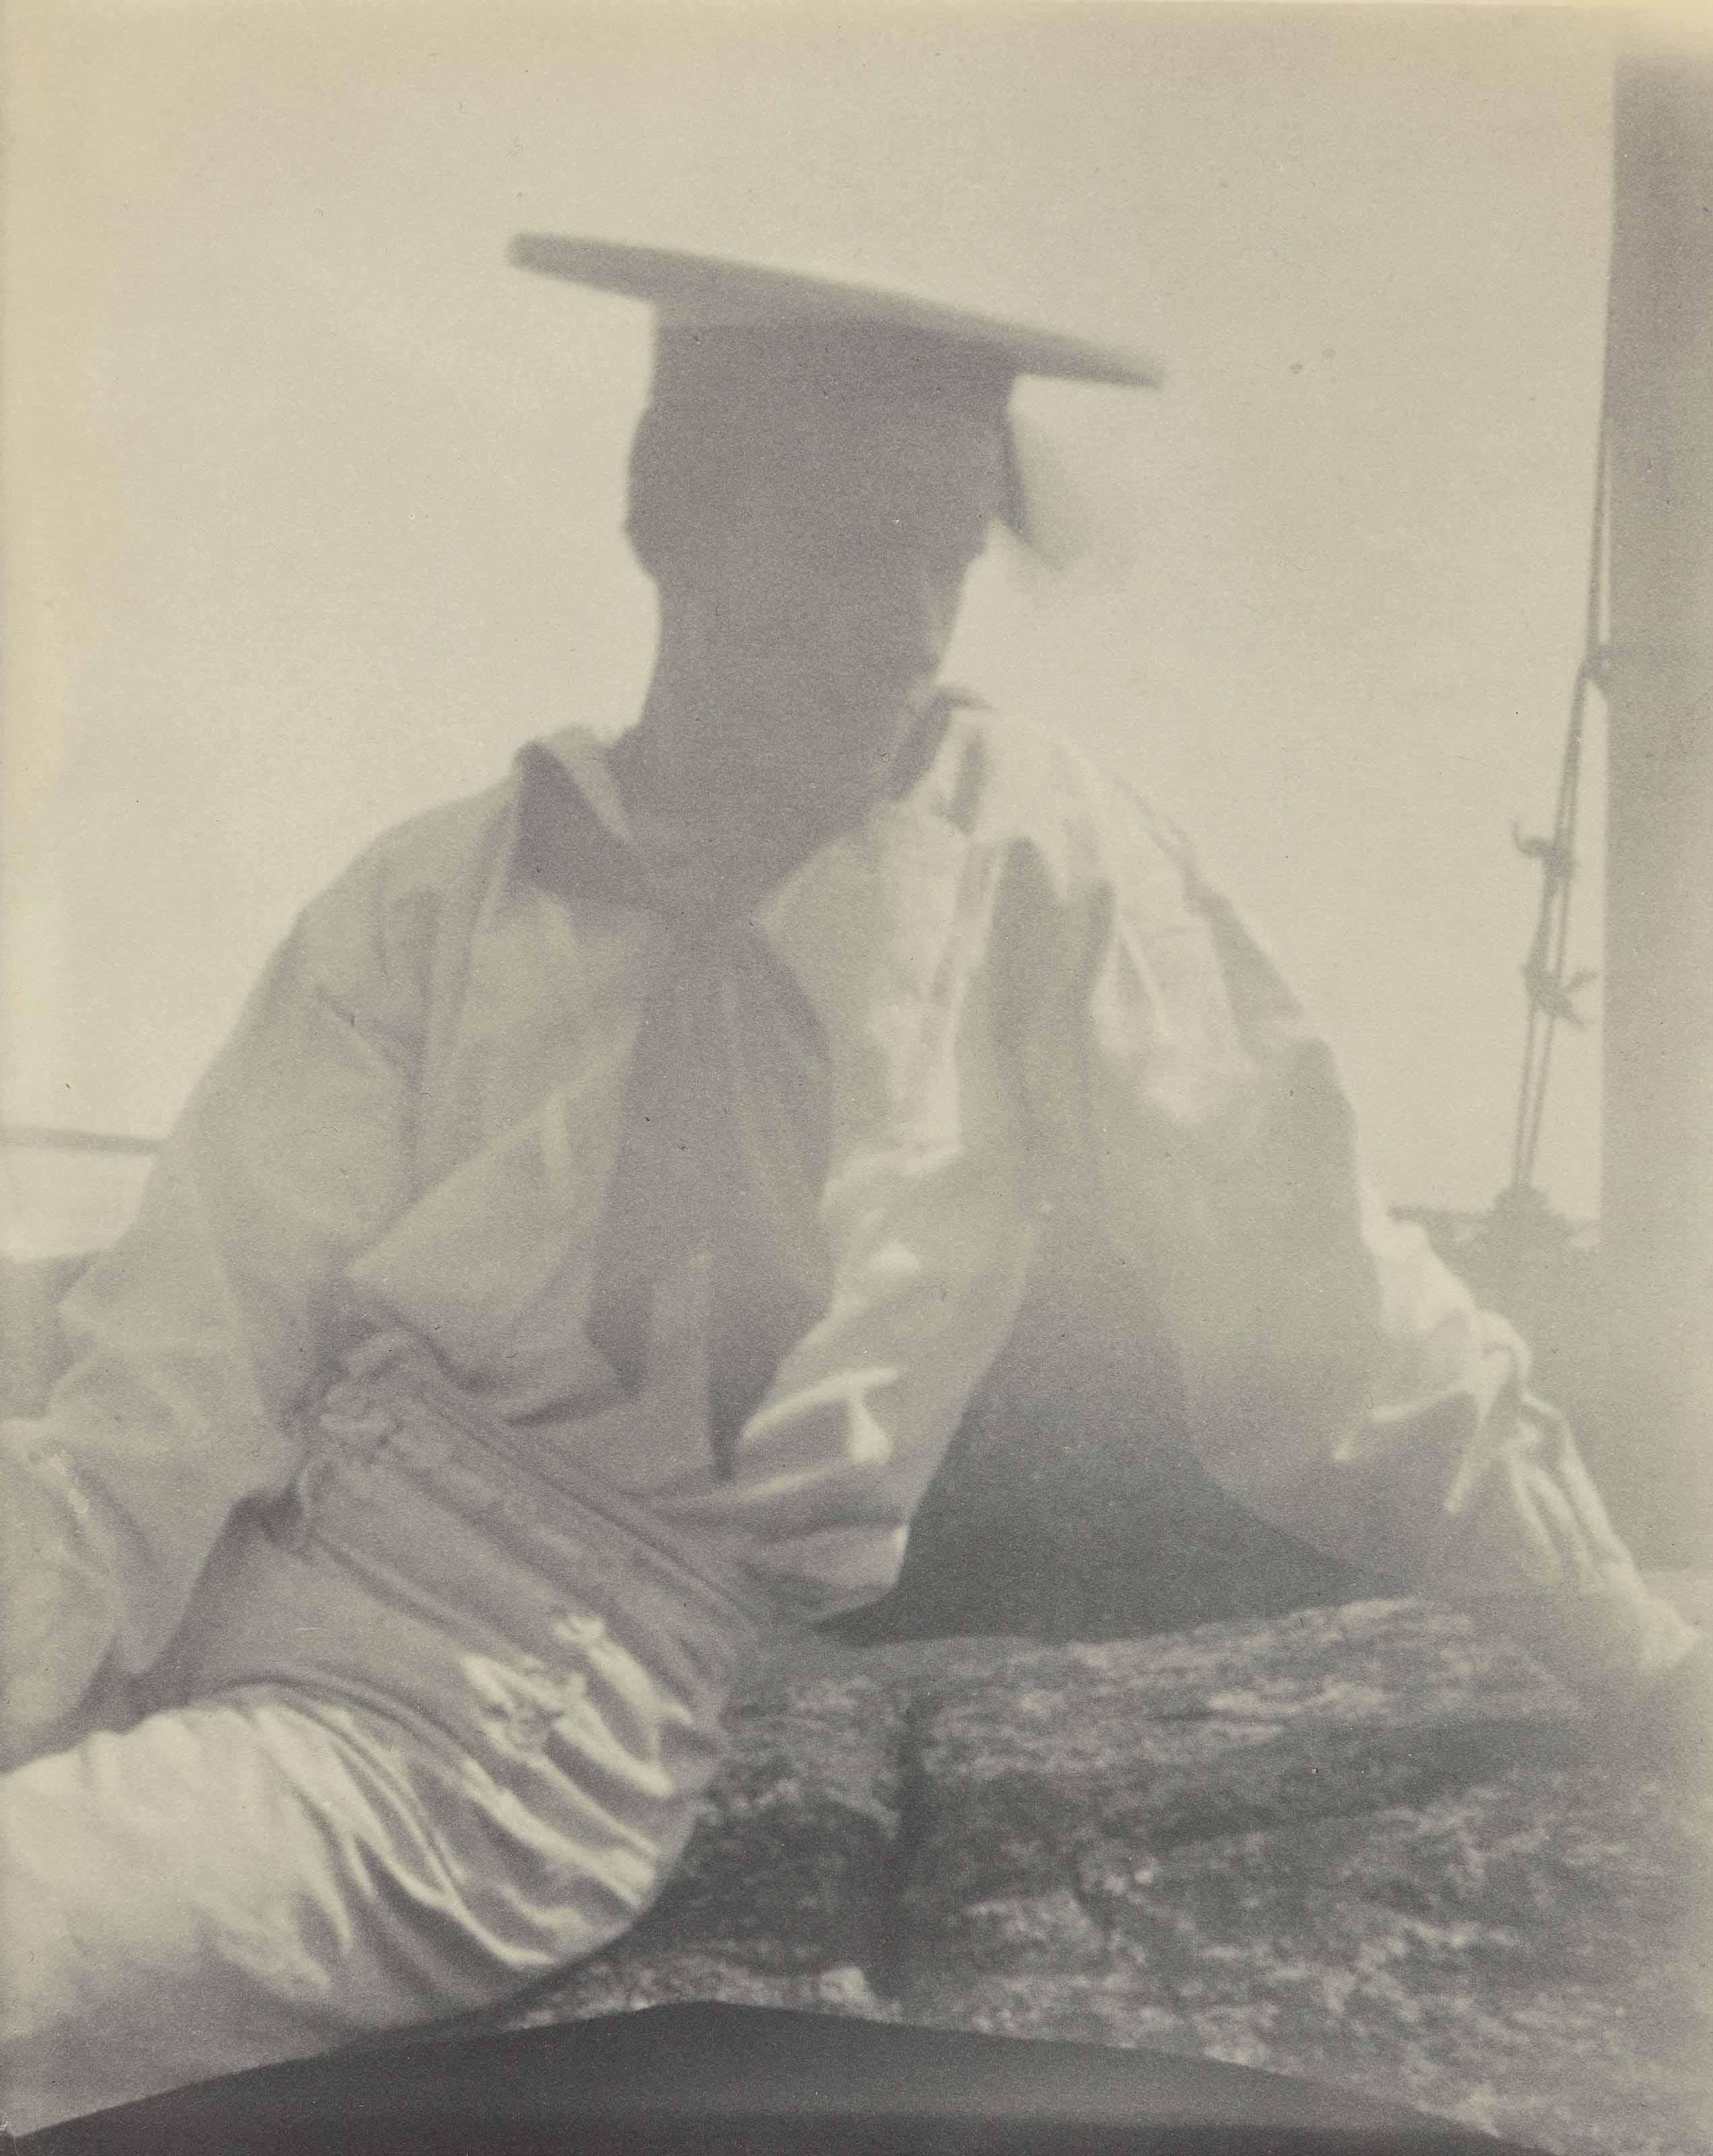 Untitled (Maynard White/Sailor on Rock, Torso), c. 1910